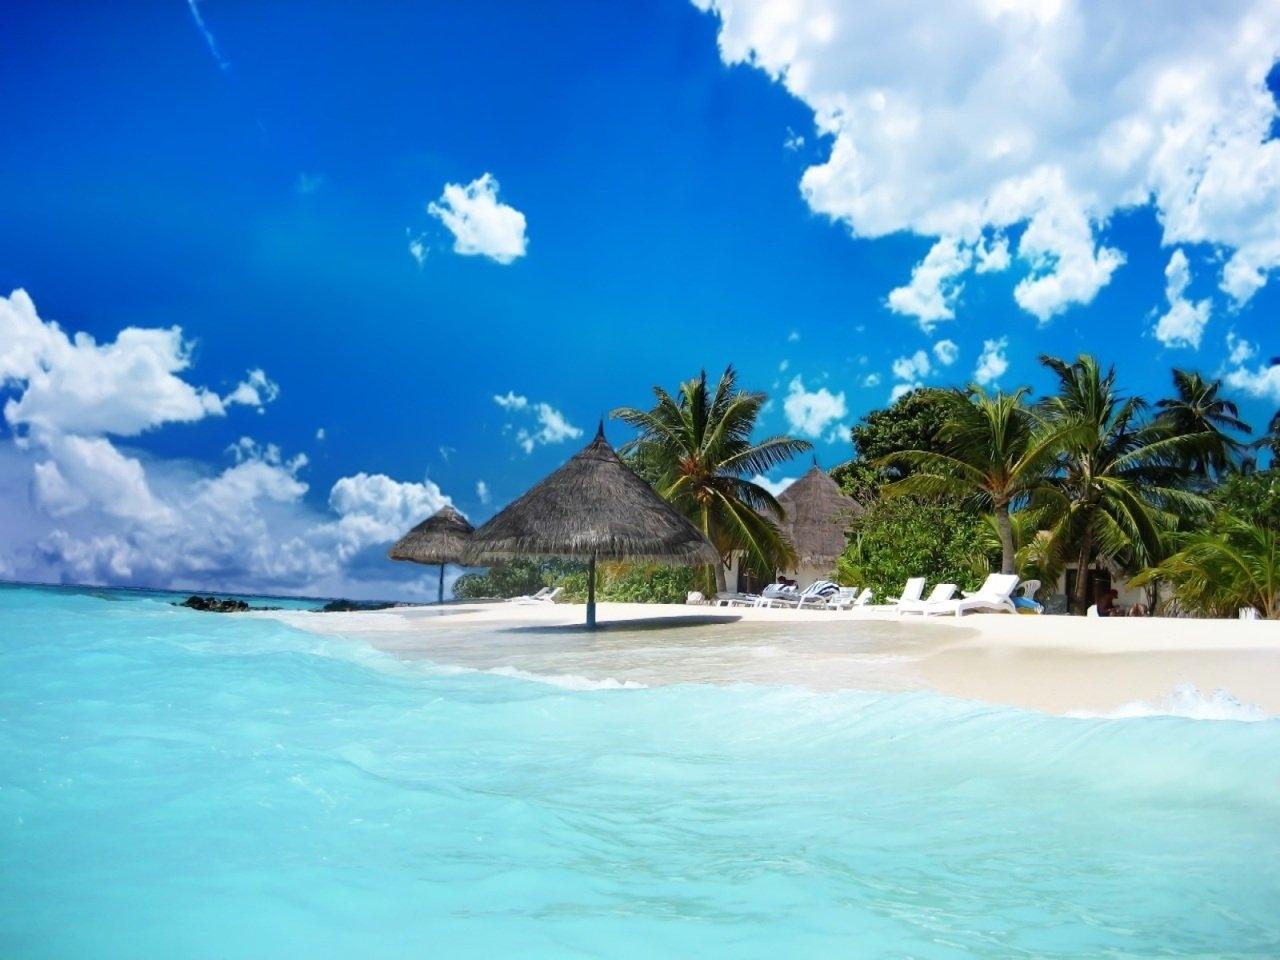 Paradise Island Bahamas Fondos de paisajes 1280x960